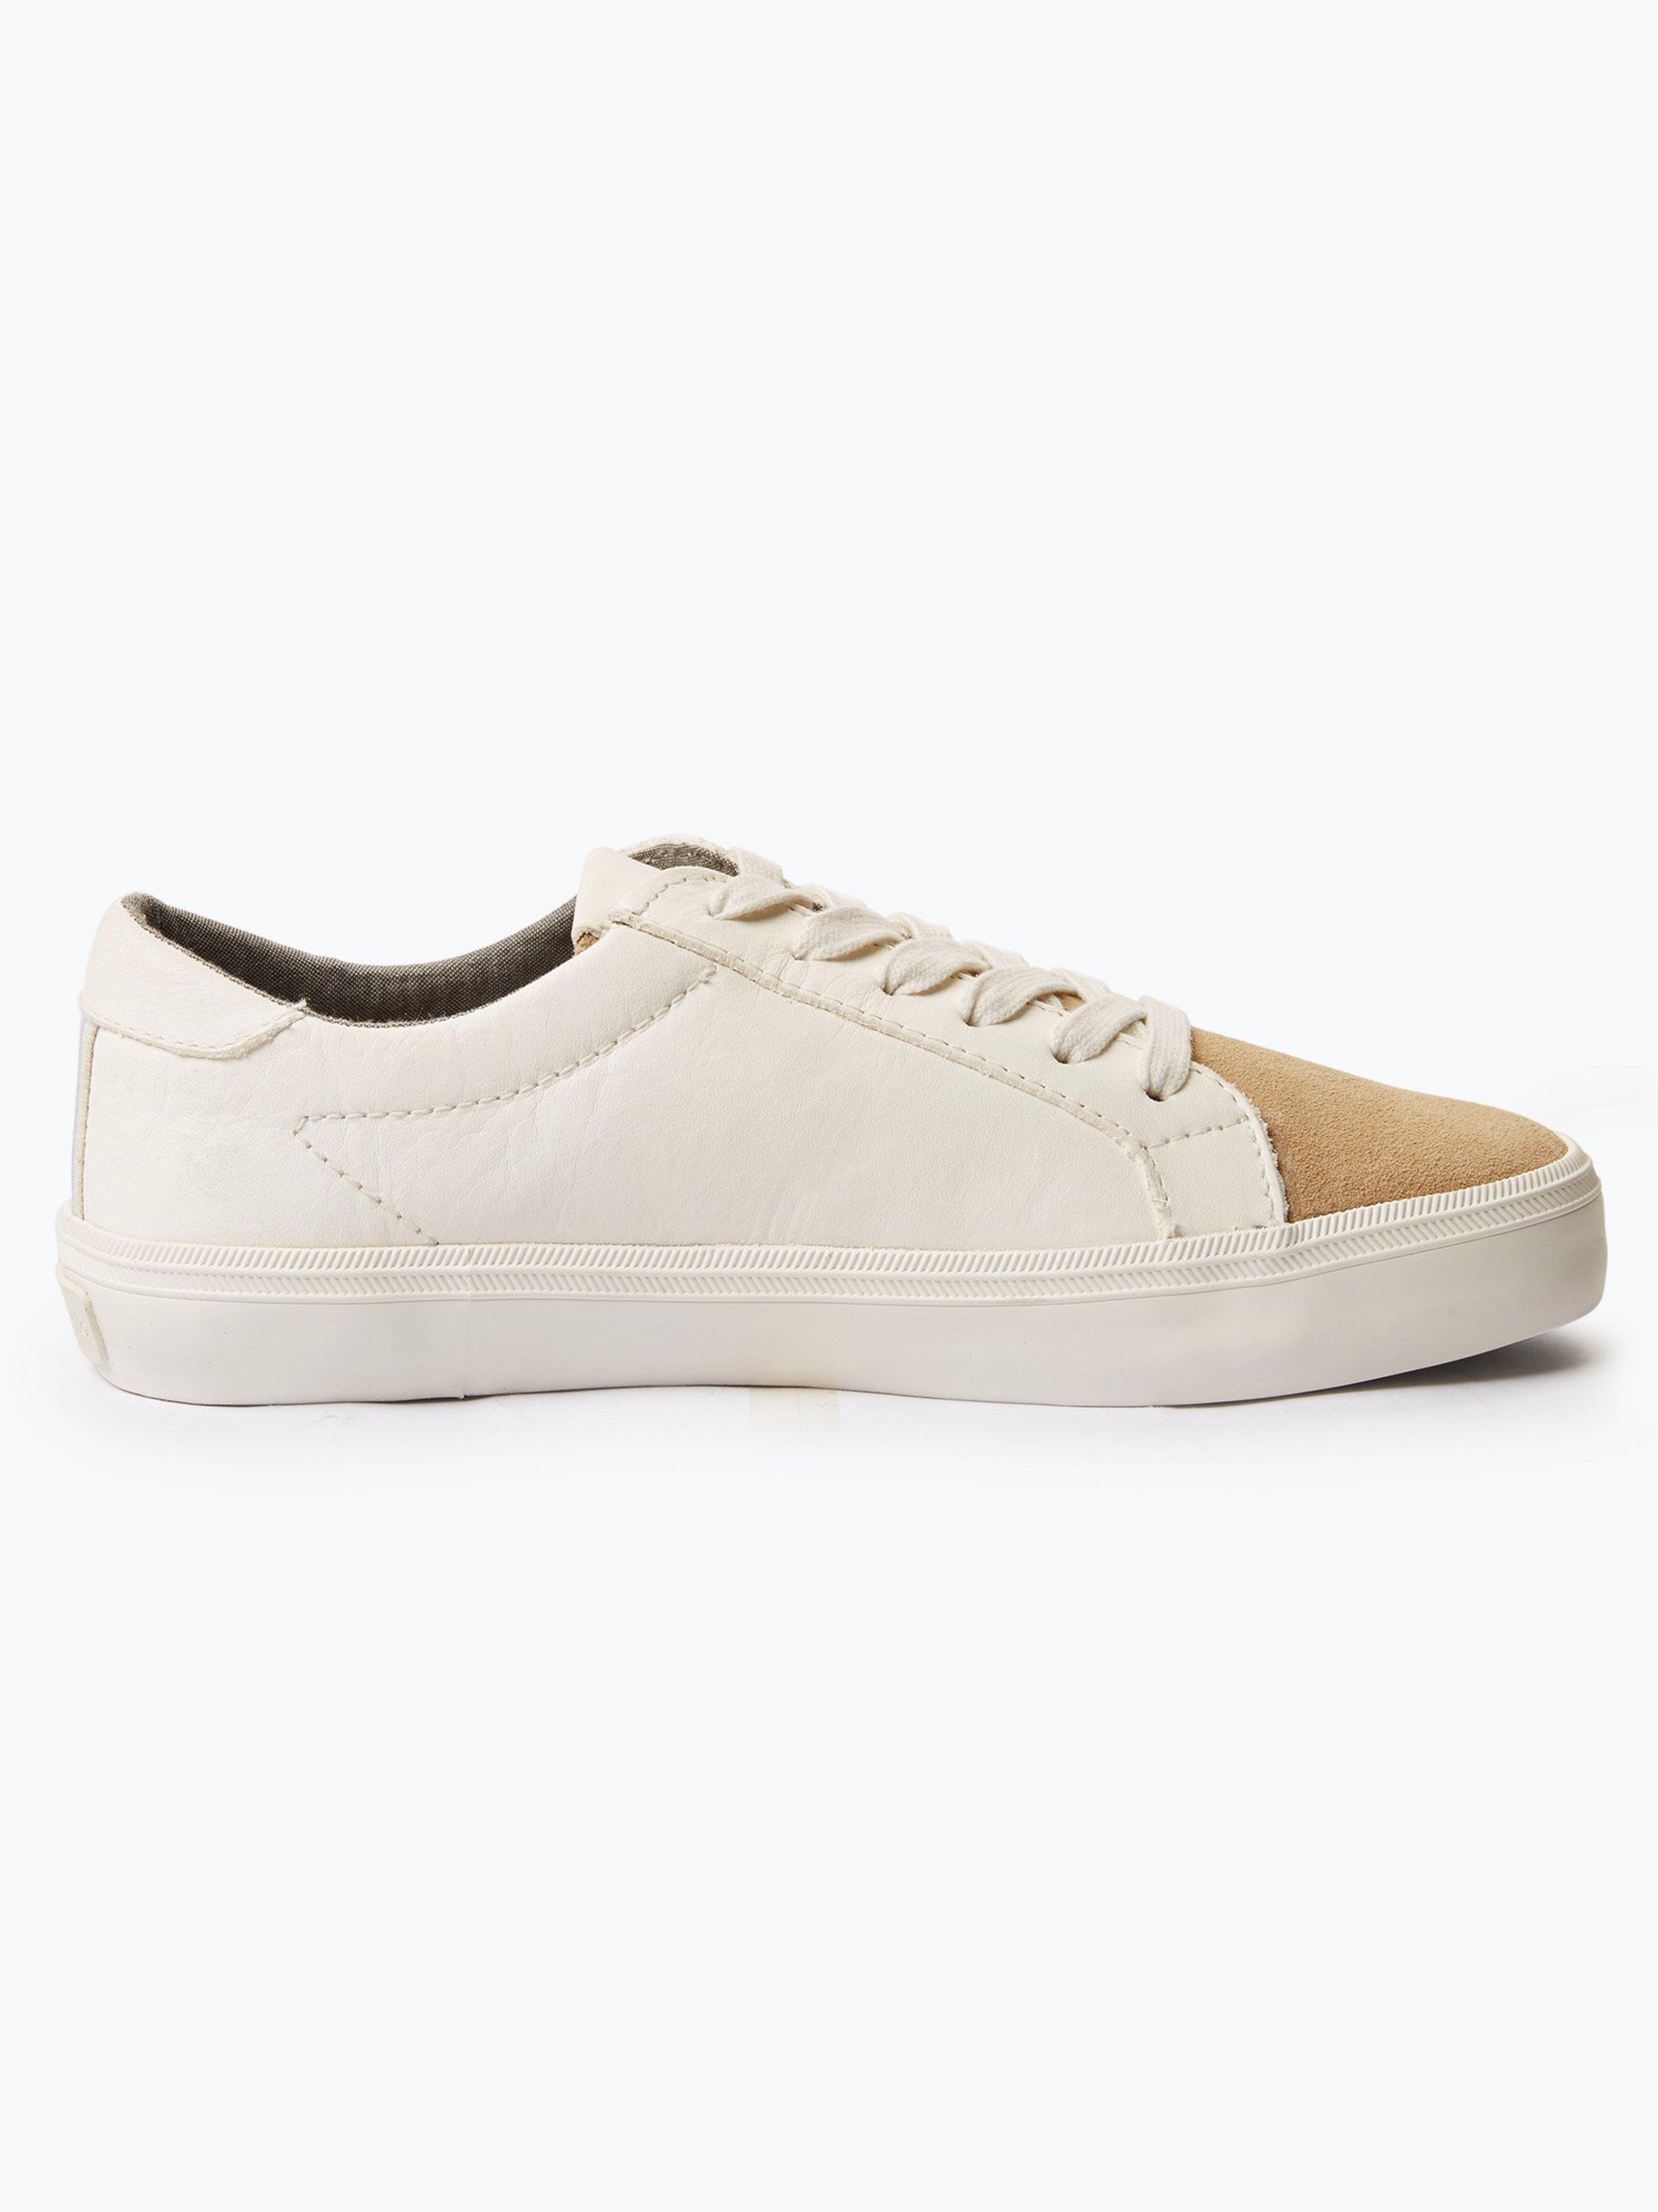 Marc O Polo Damen Sneaker aus Leder beige uni online kaufen ... eb9b2b7aae